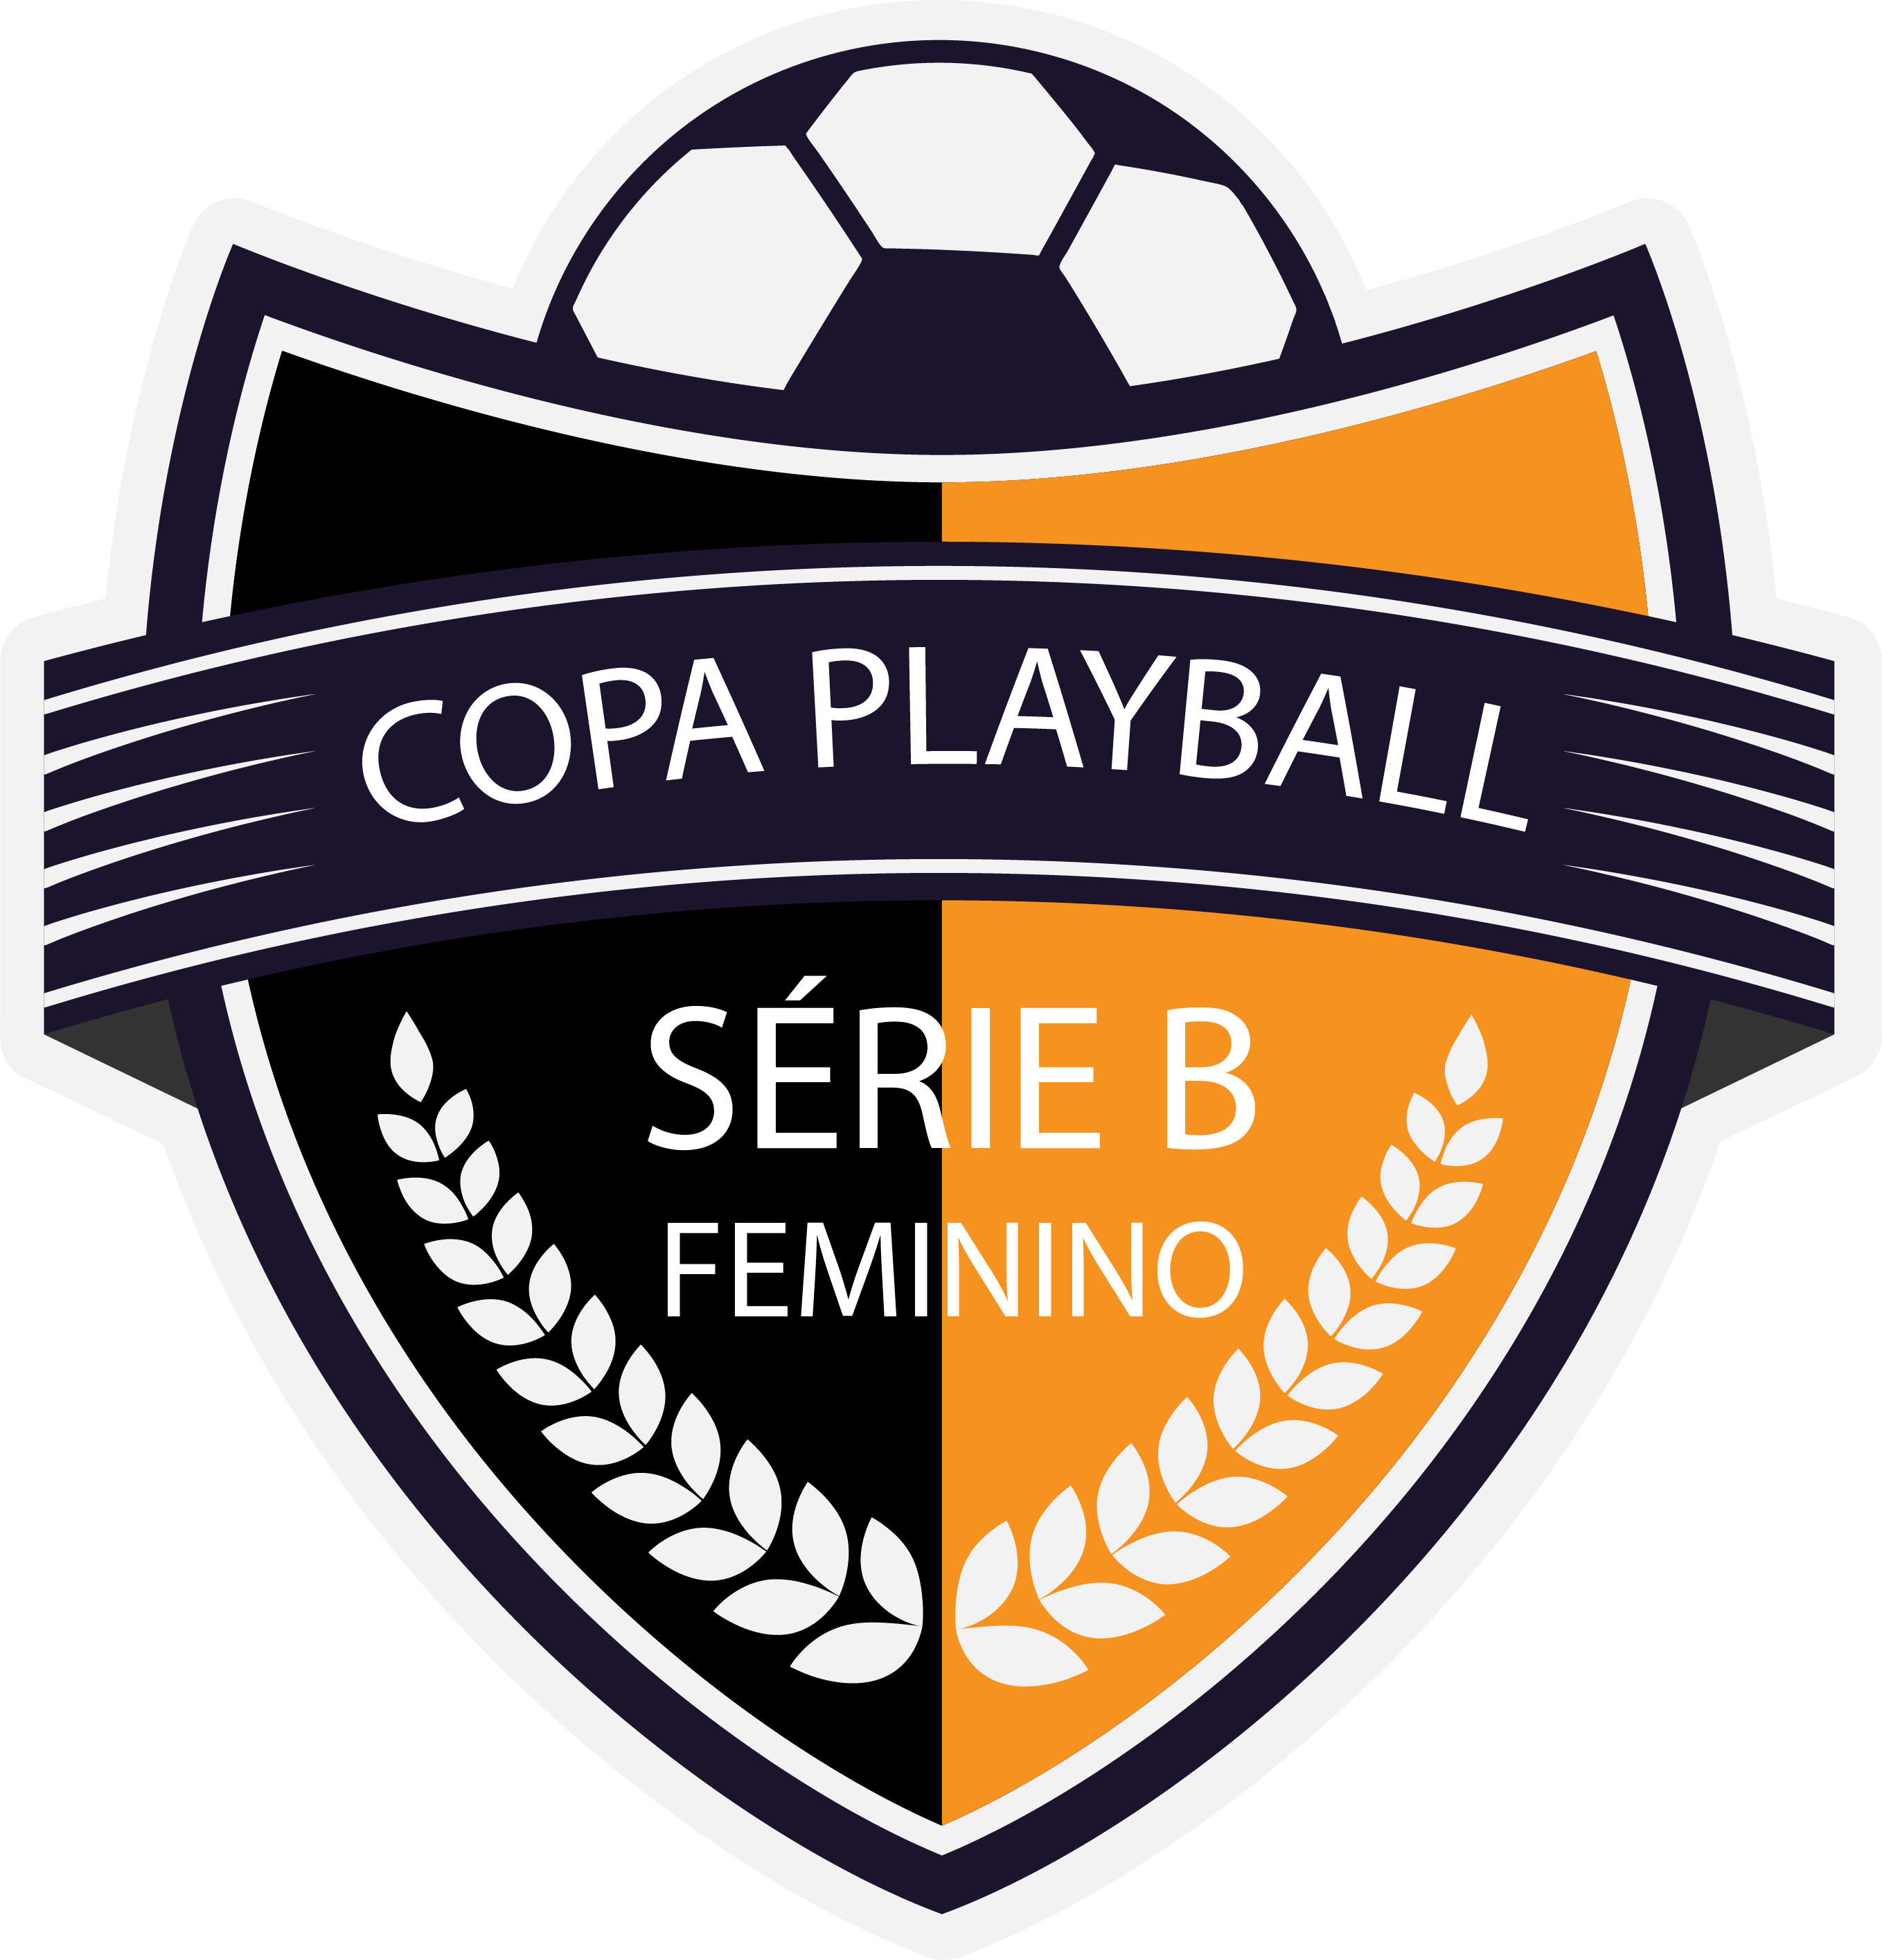 3º Copa Playball Feminina Serie B